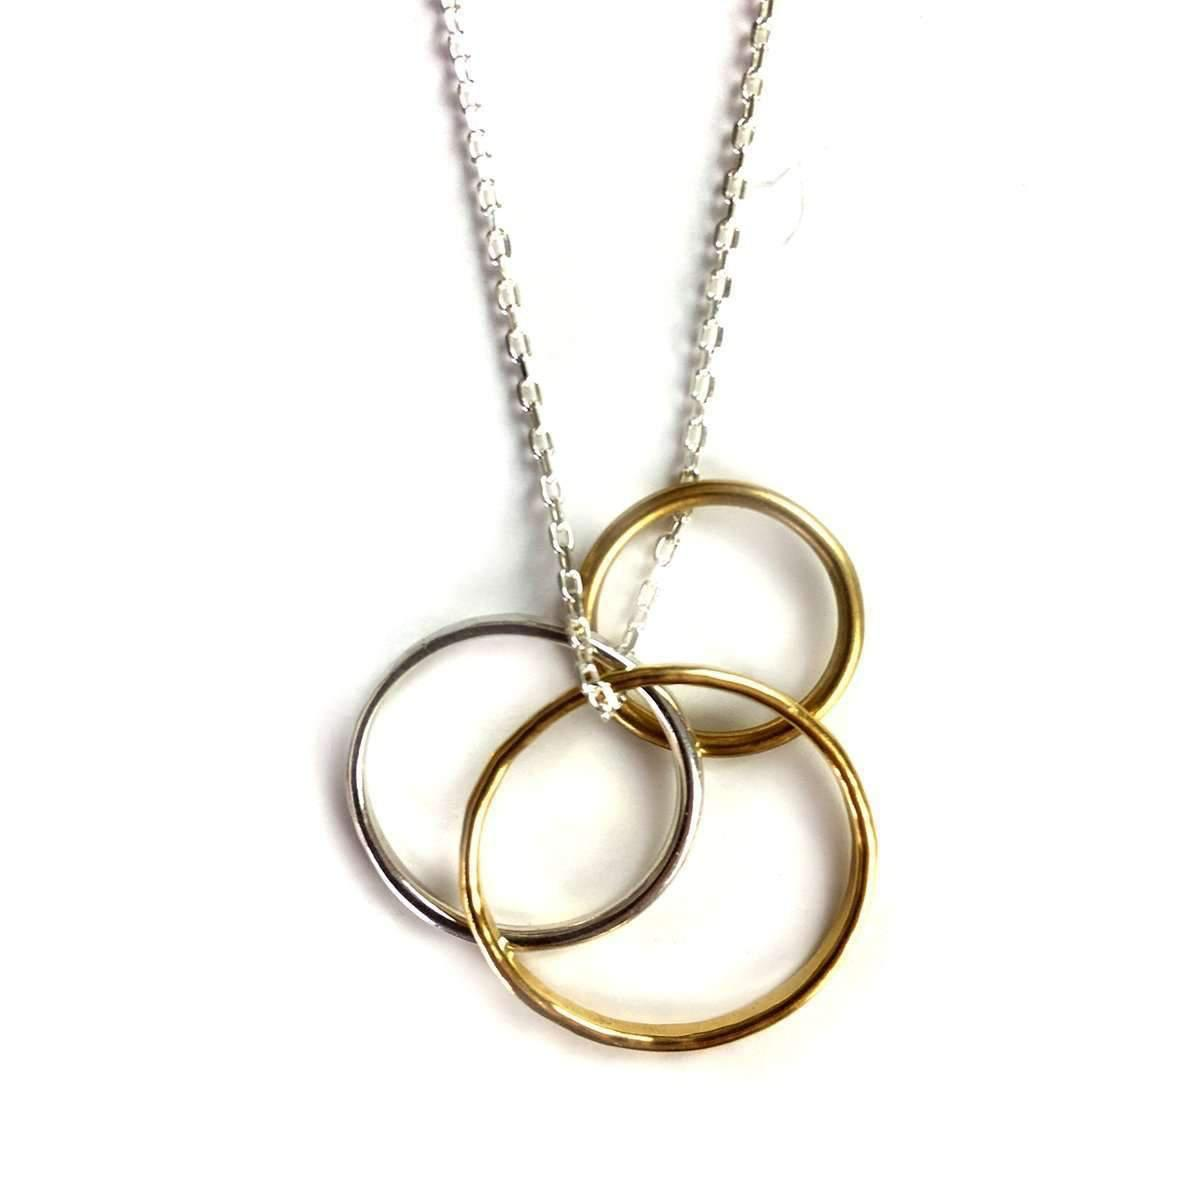 Fran Regan Jewellery Pendant Vermeil Double Loop On Gold Chain KHt5Ahj